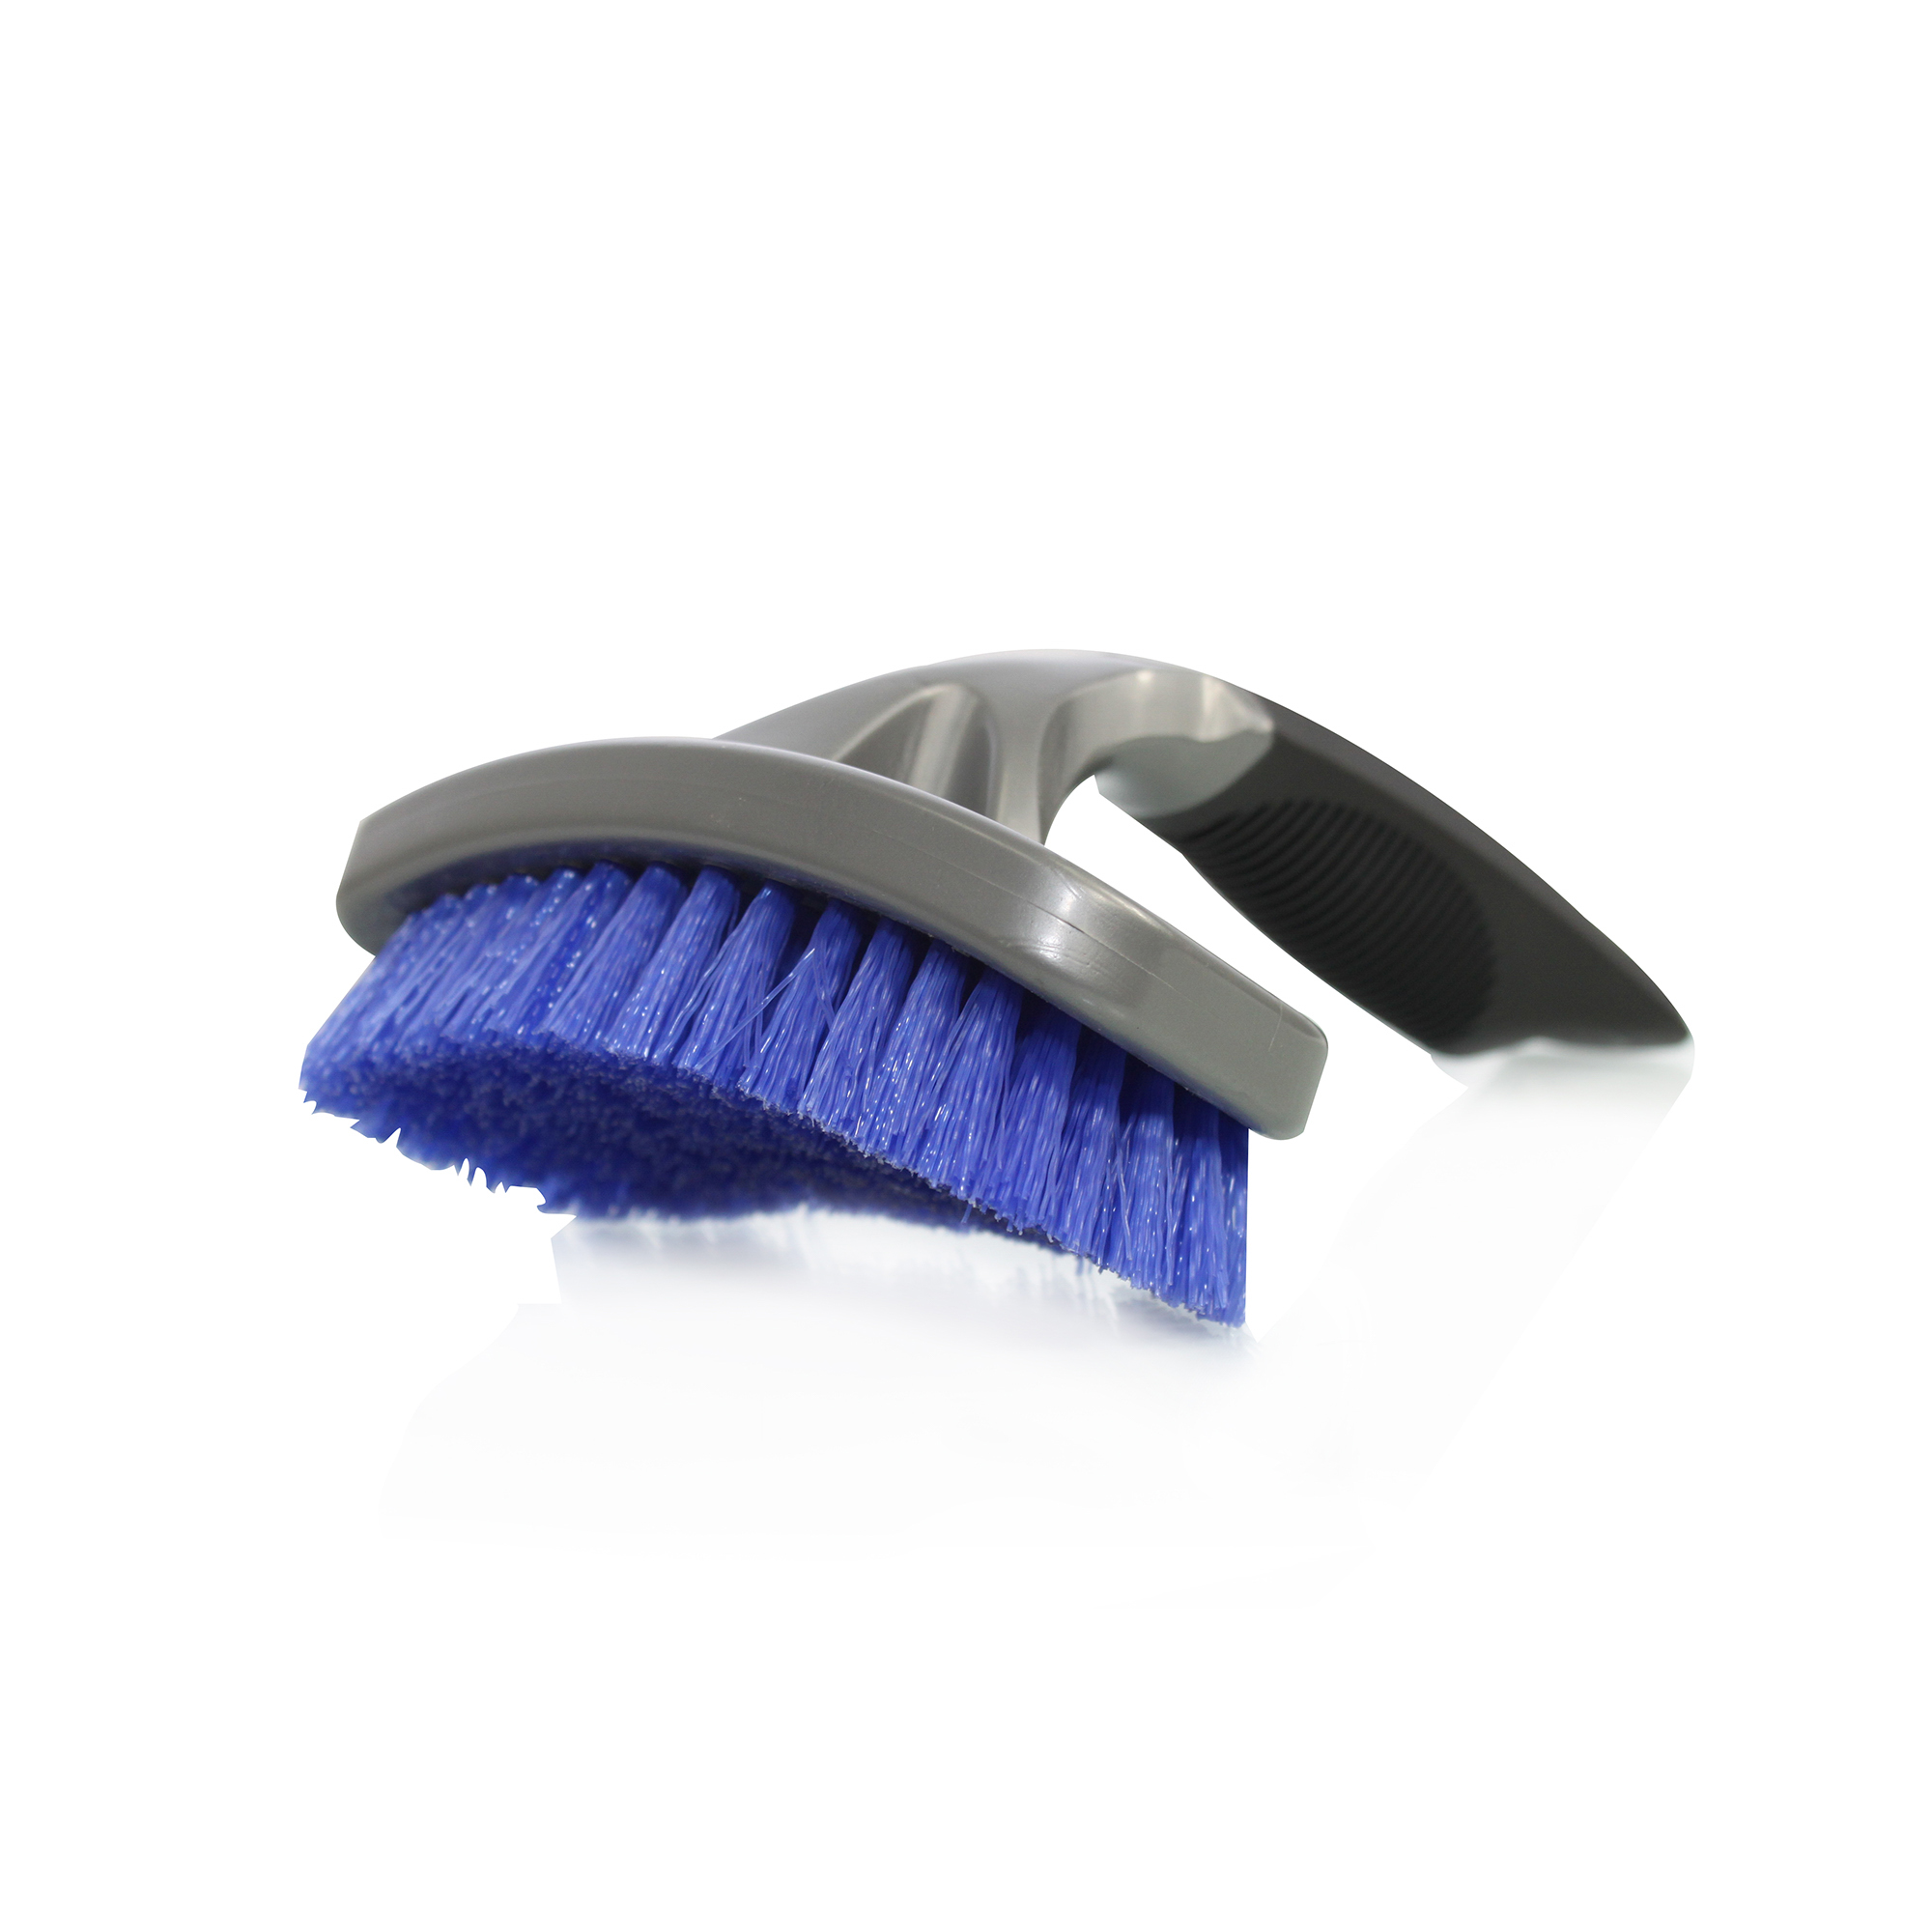 4 Packs Car Wheel Cleaning Brush Kit for Auto Vehicle Detail Brush Curved Tire Brush Including Rim Brush Engine Short Handle Tyre Soft Brush Motorcycle